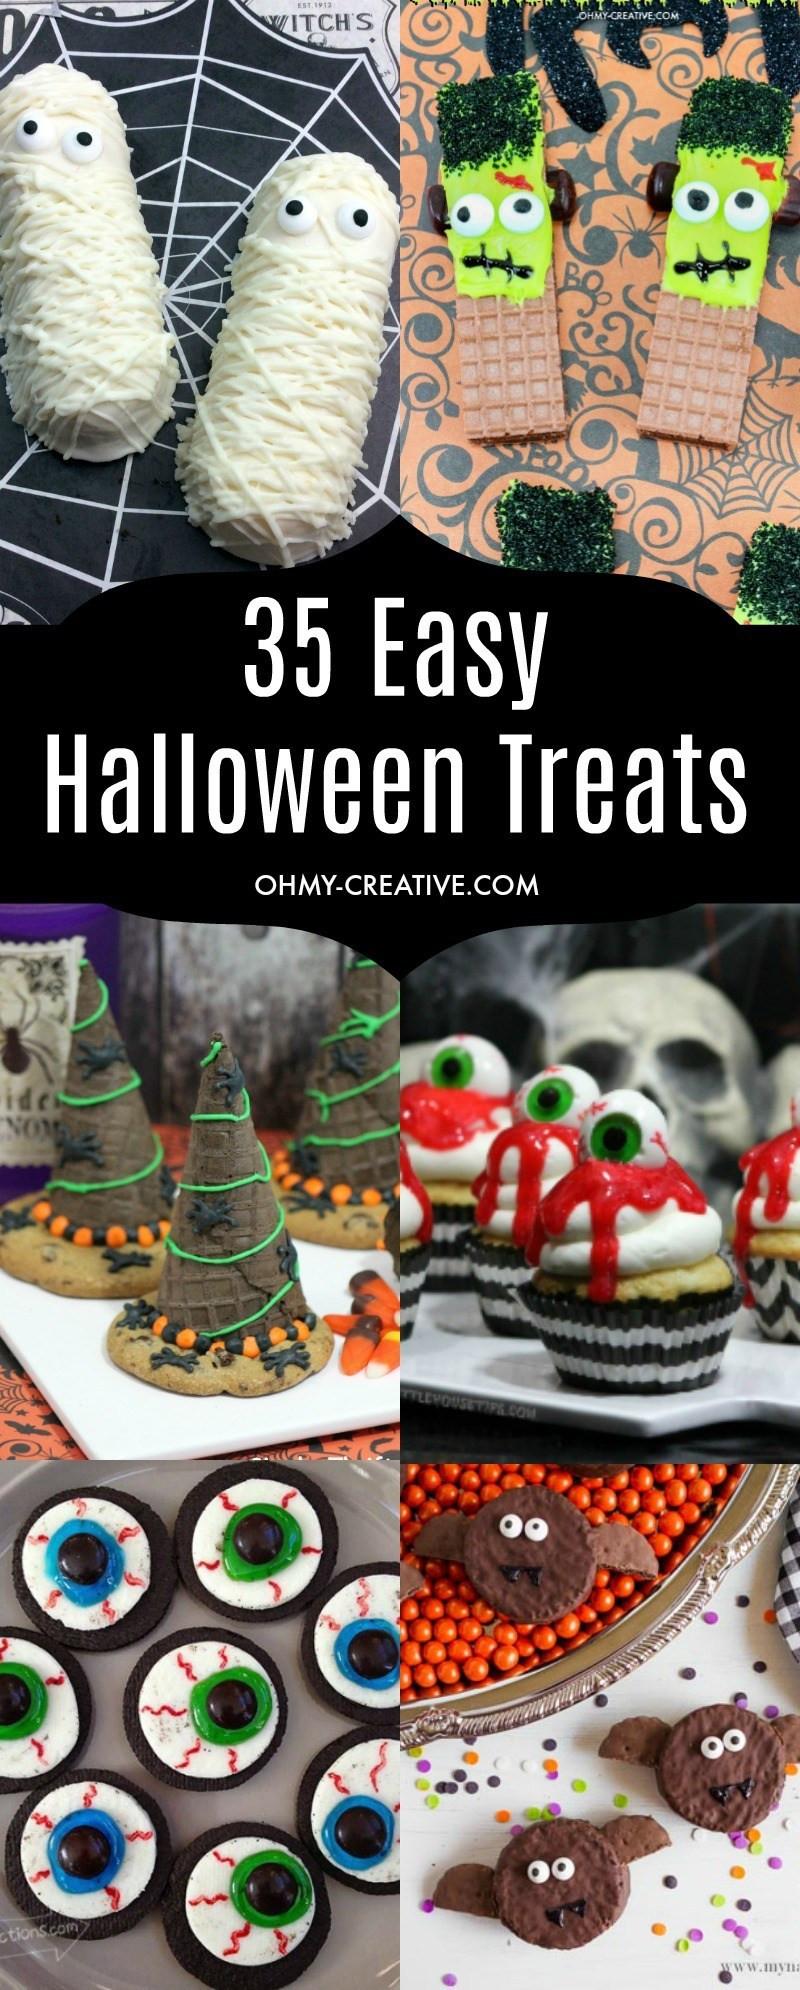 Creative Halloween Desserts  Easy Halloween Treats To Make Oh My Creative